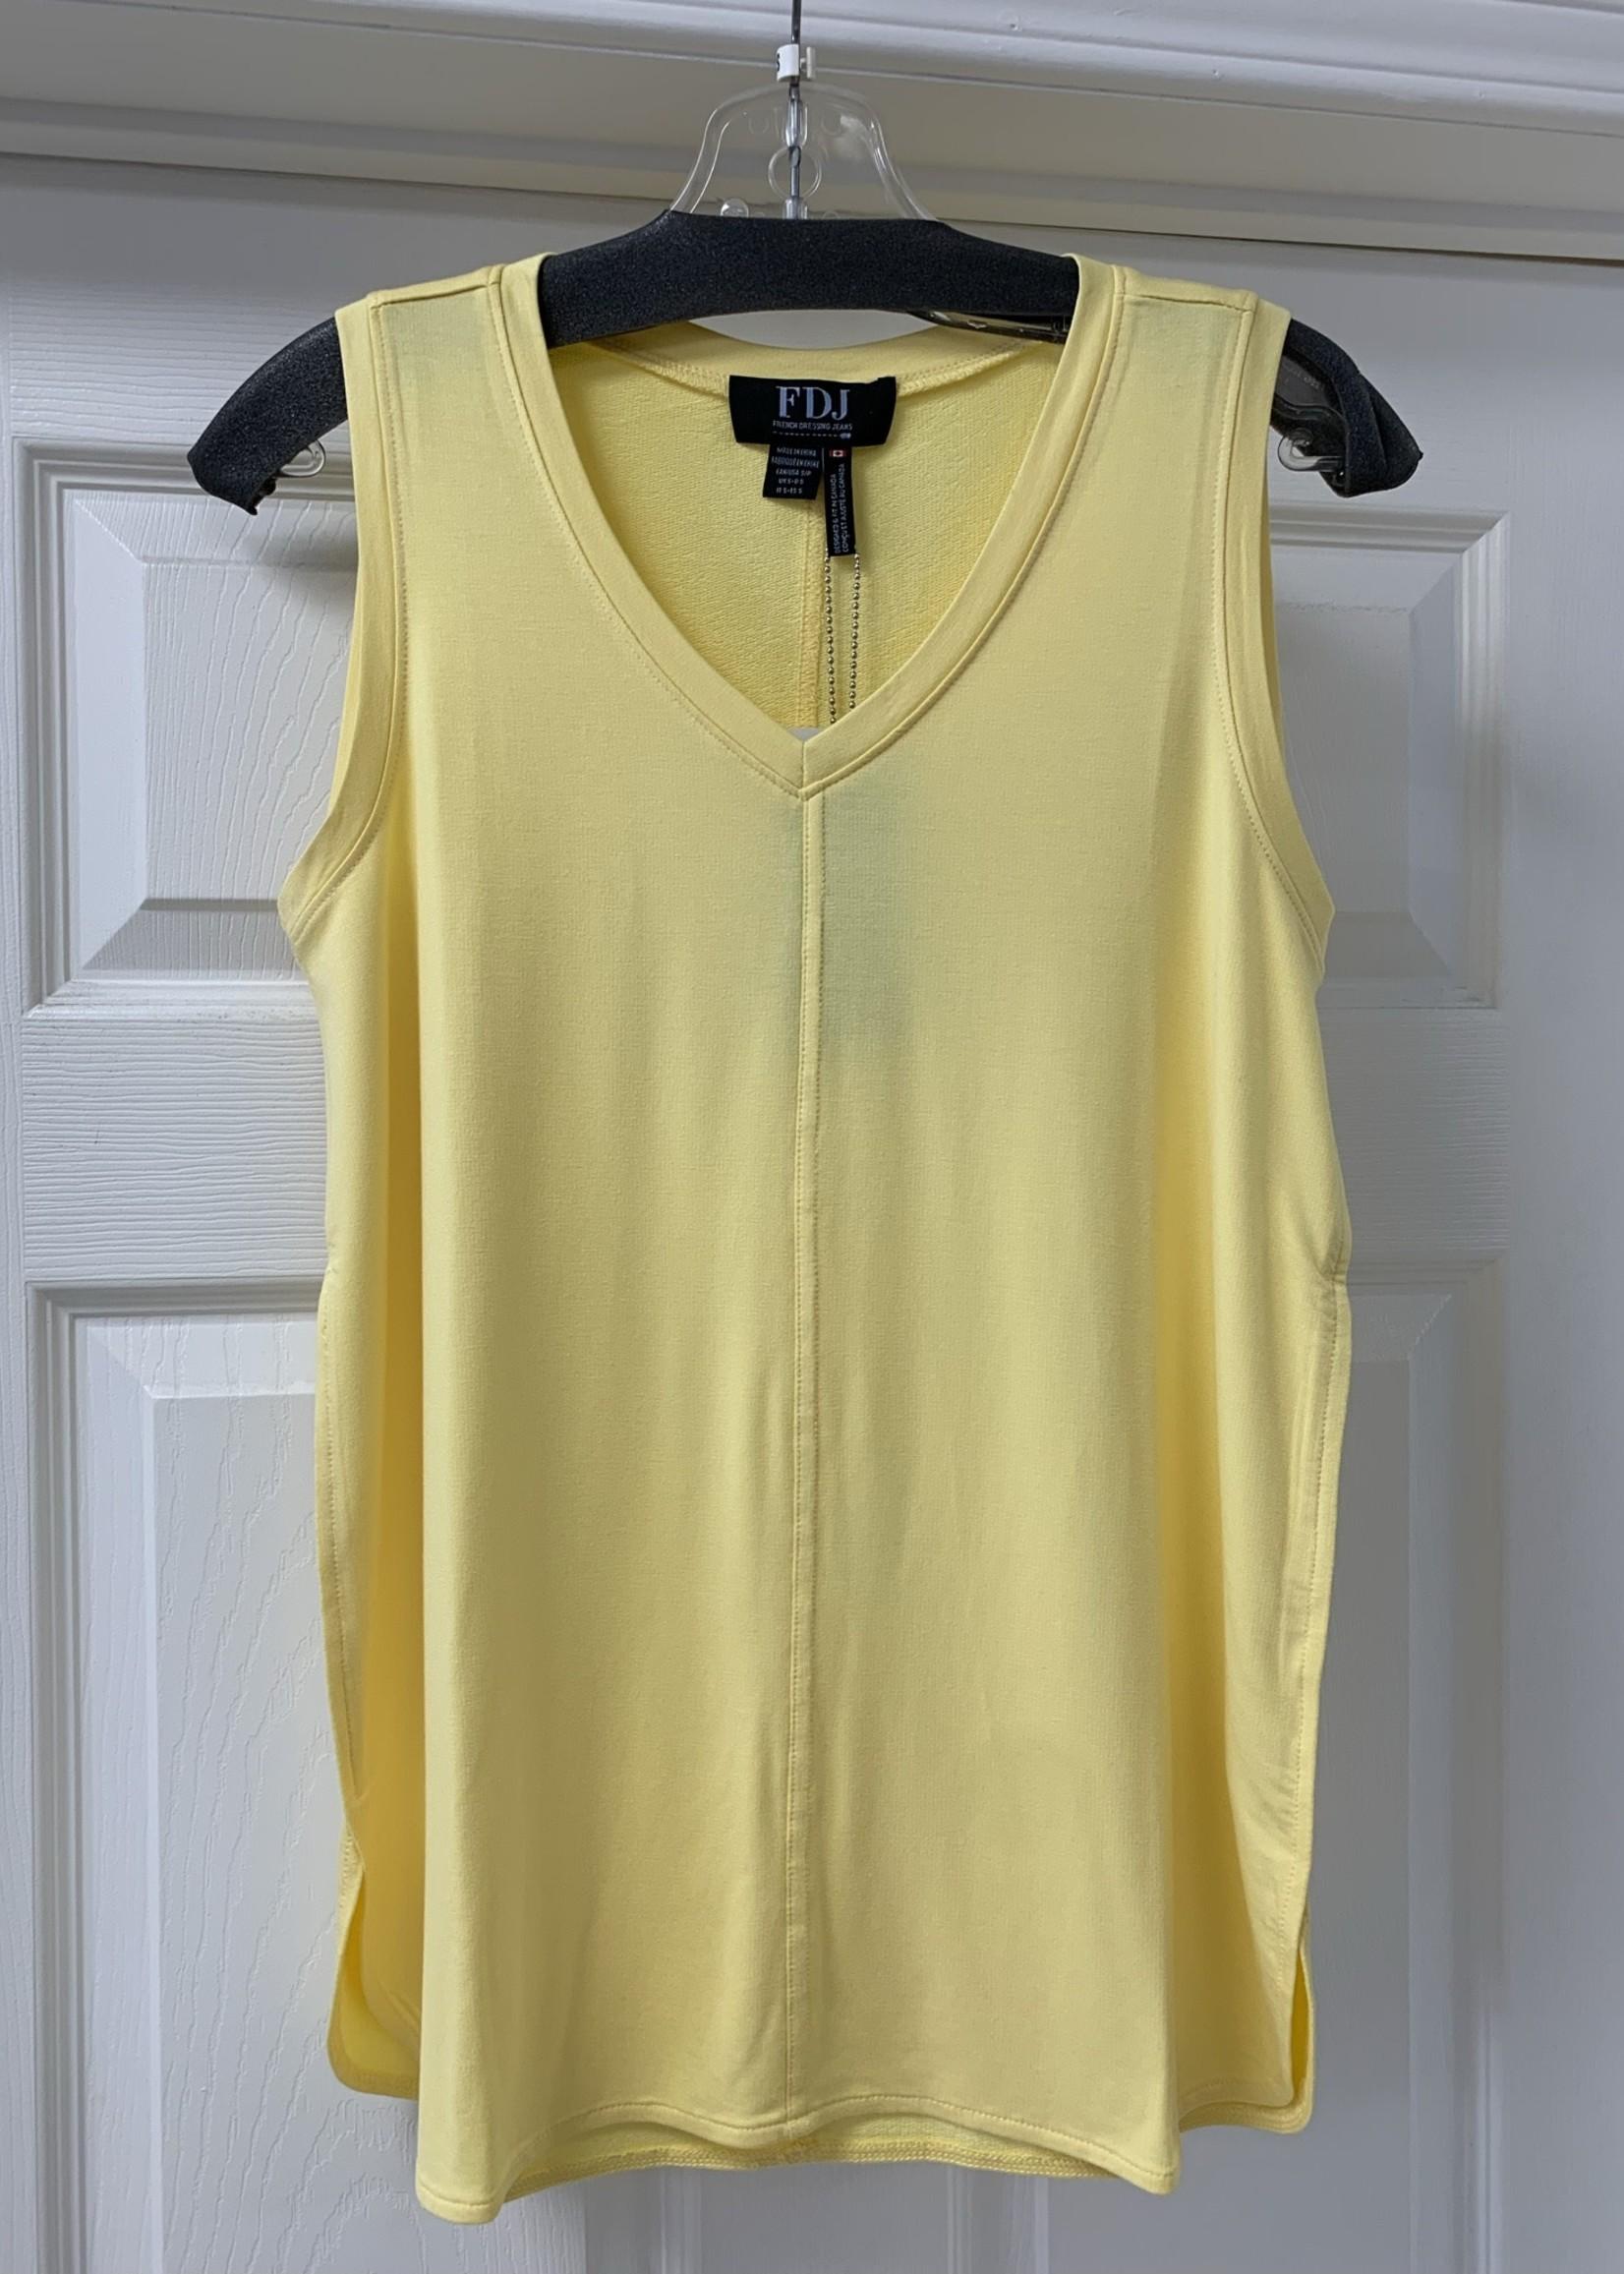 FDJ French Dressing FDJ V-Neck Cami Lemon 1933571